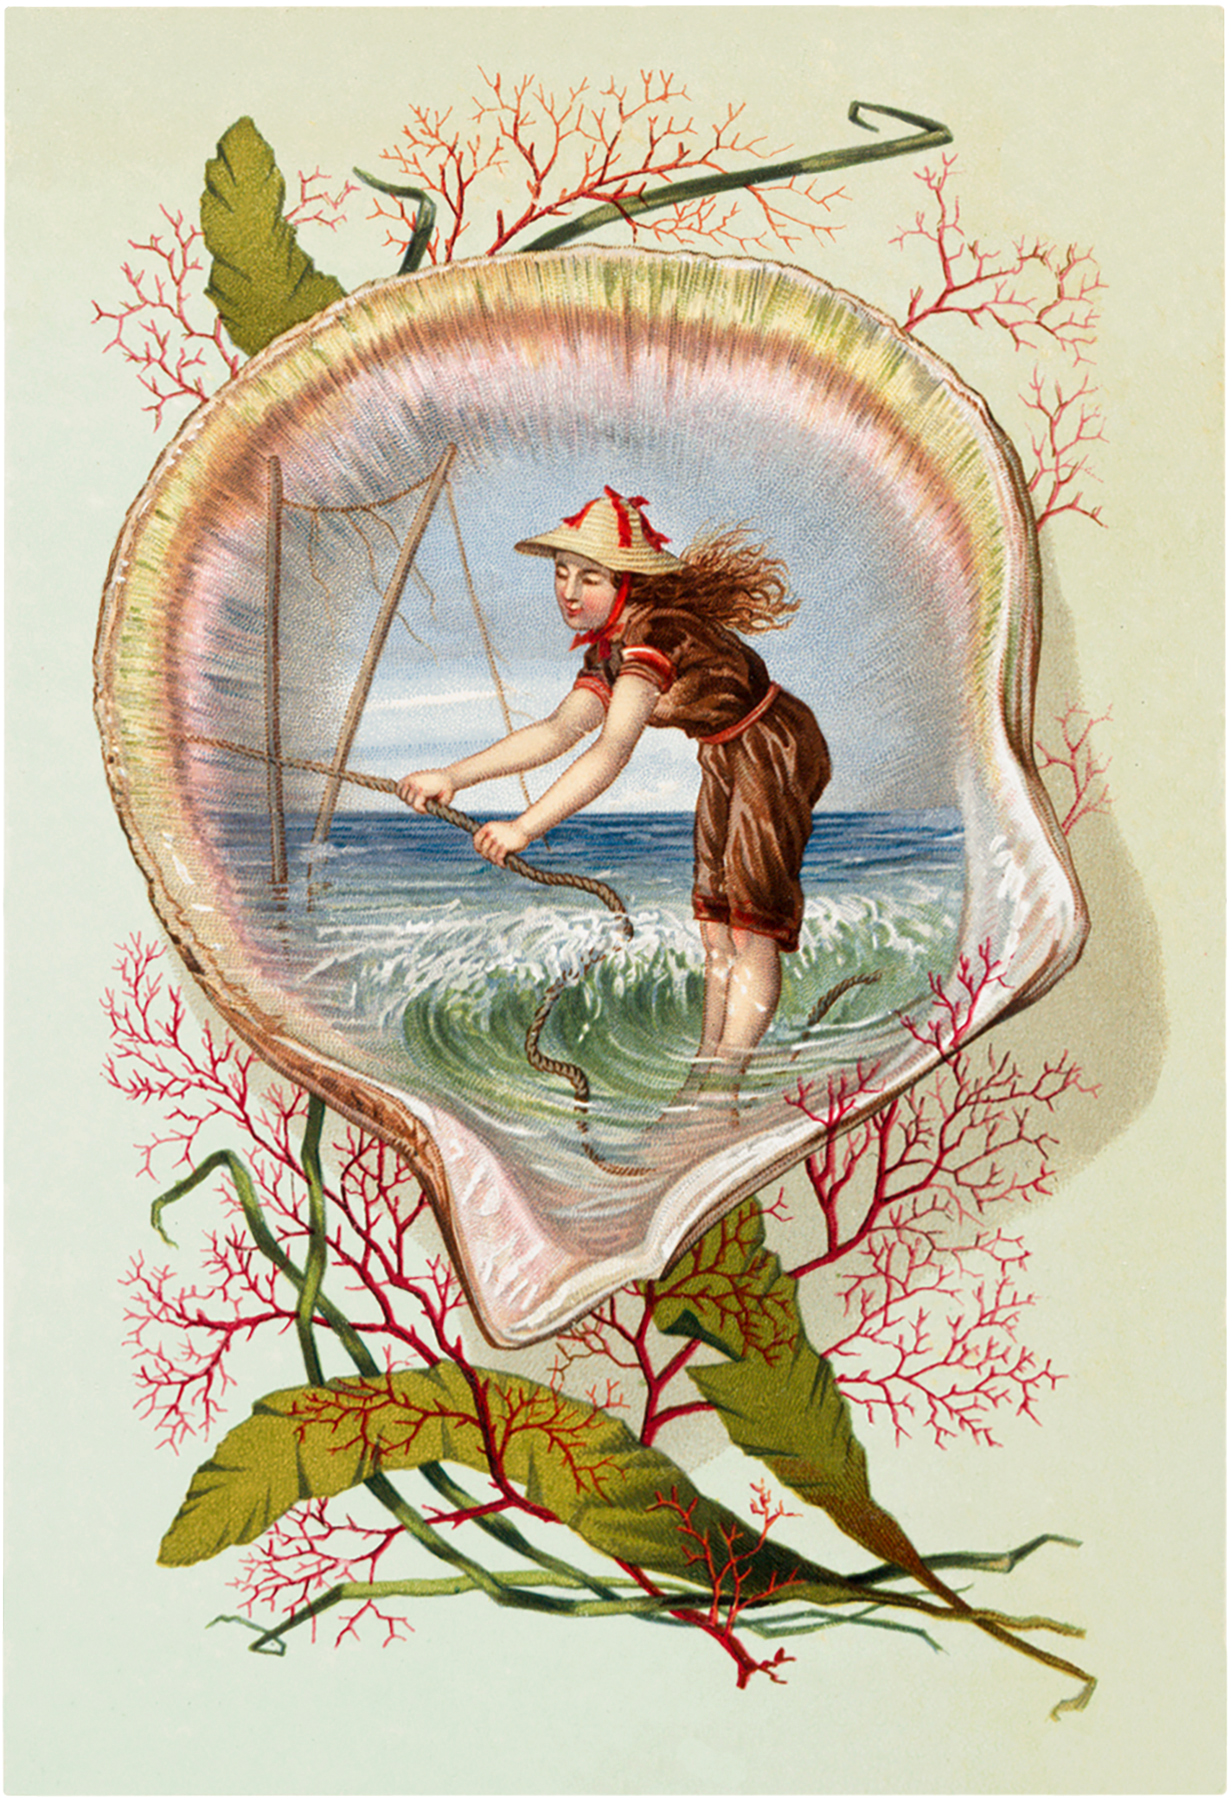 Vintage Seashell Scene Image The Graphics Fairy